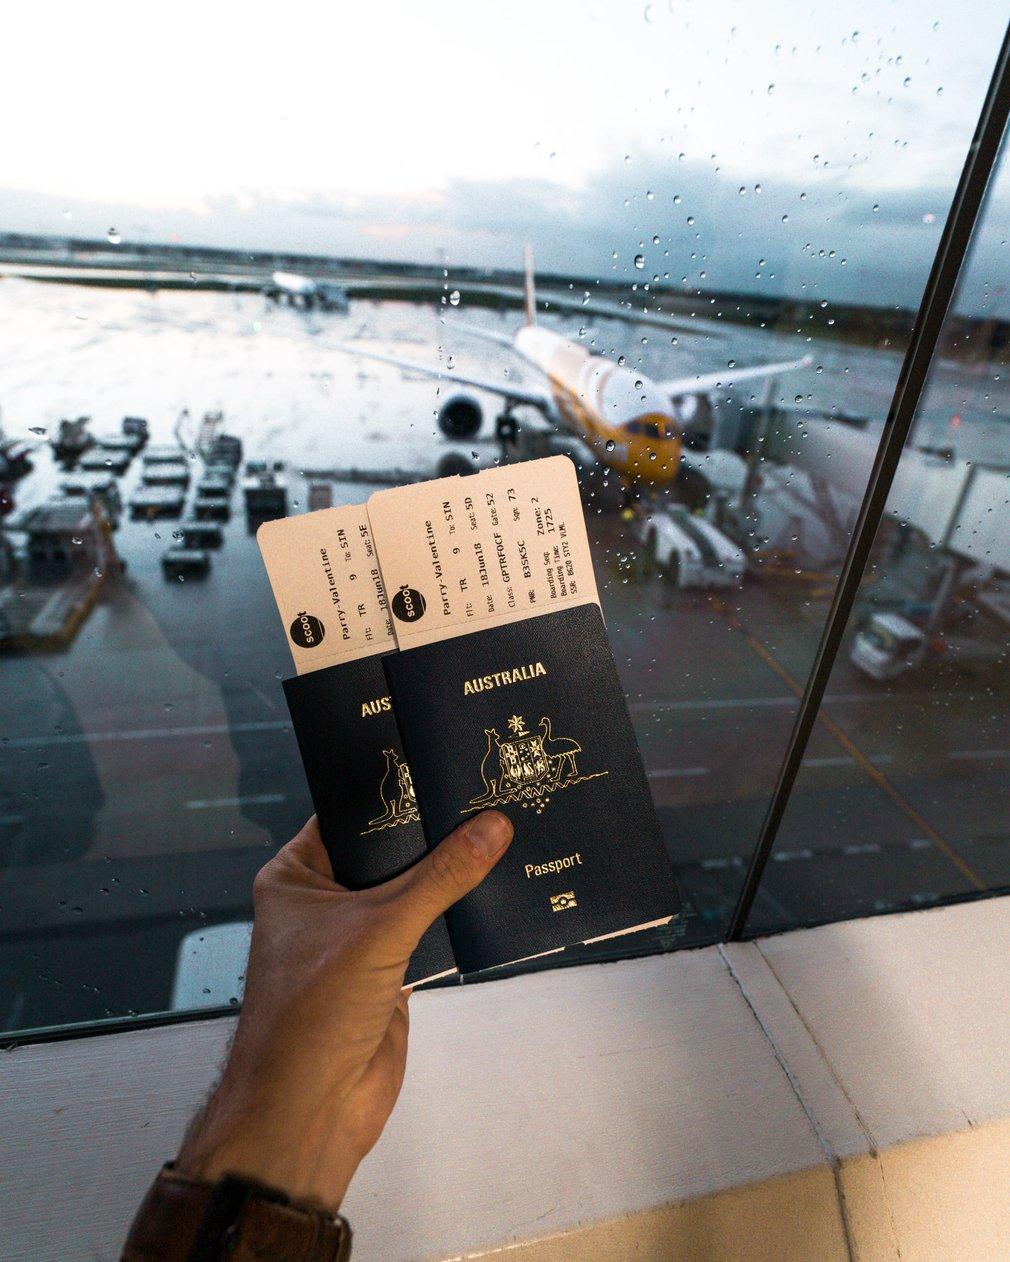 Australian passport and scoot plane